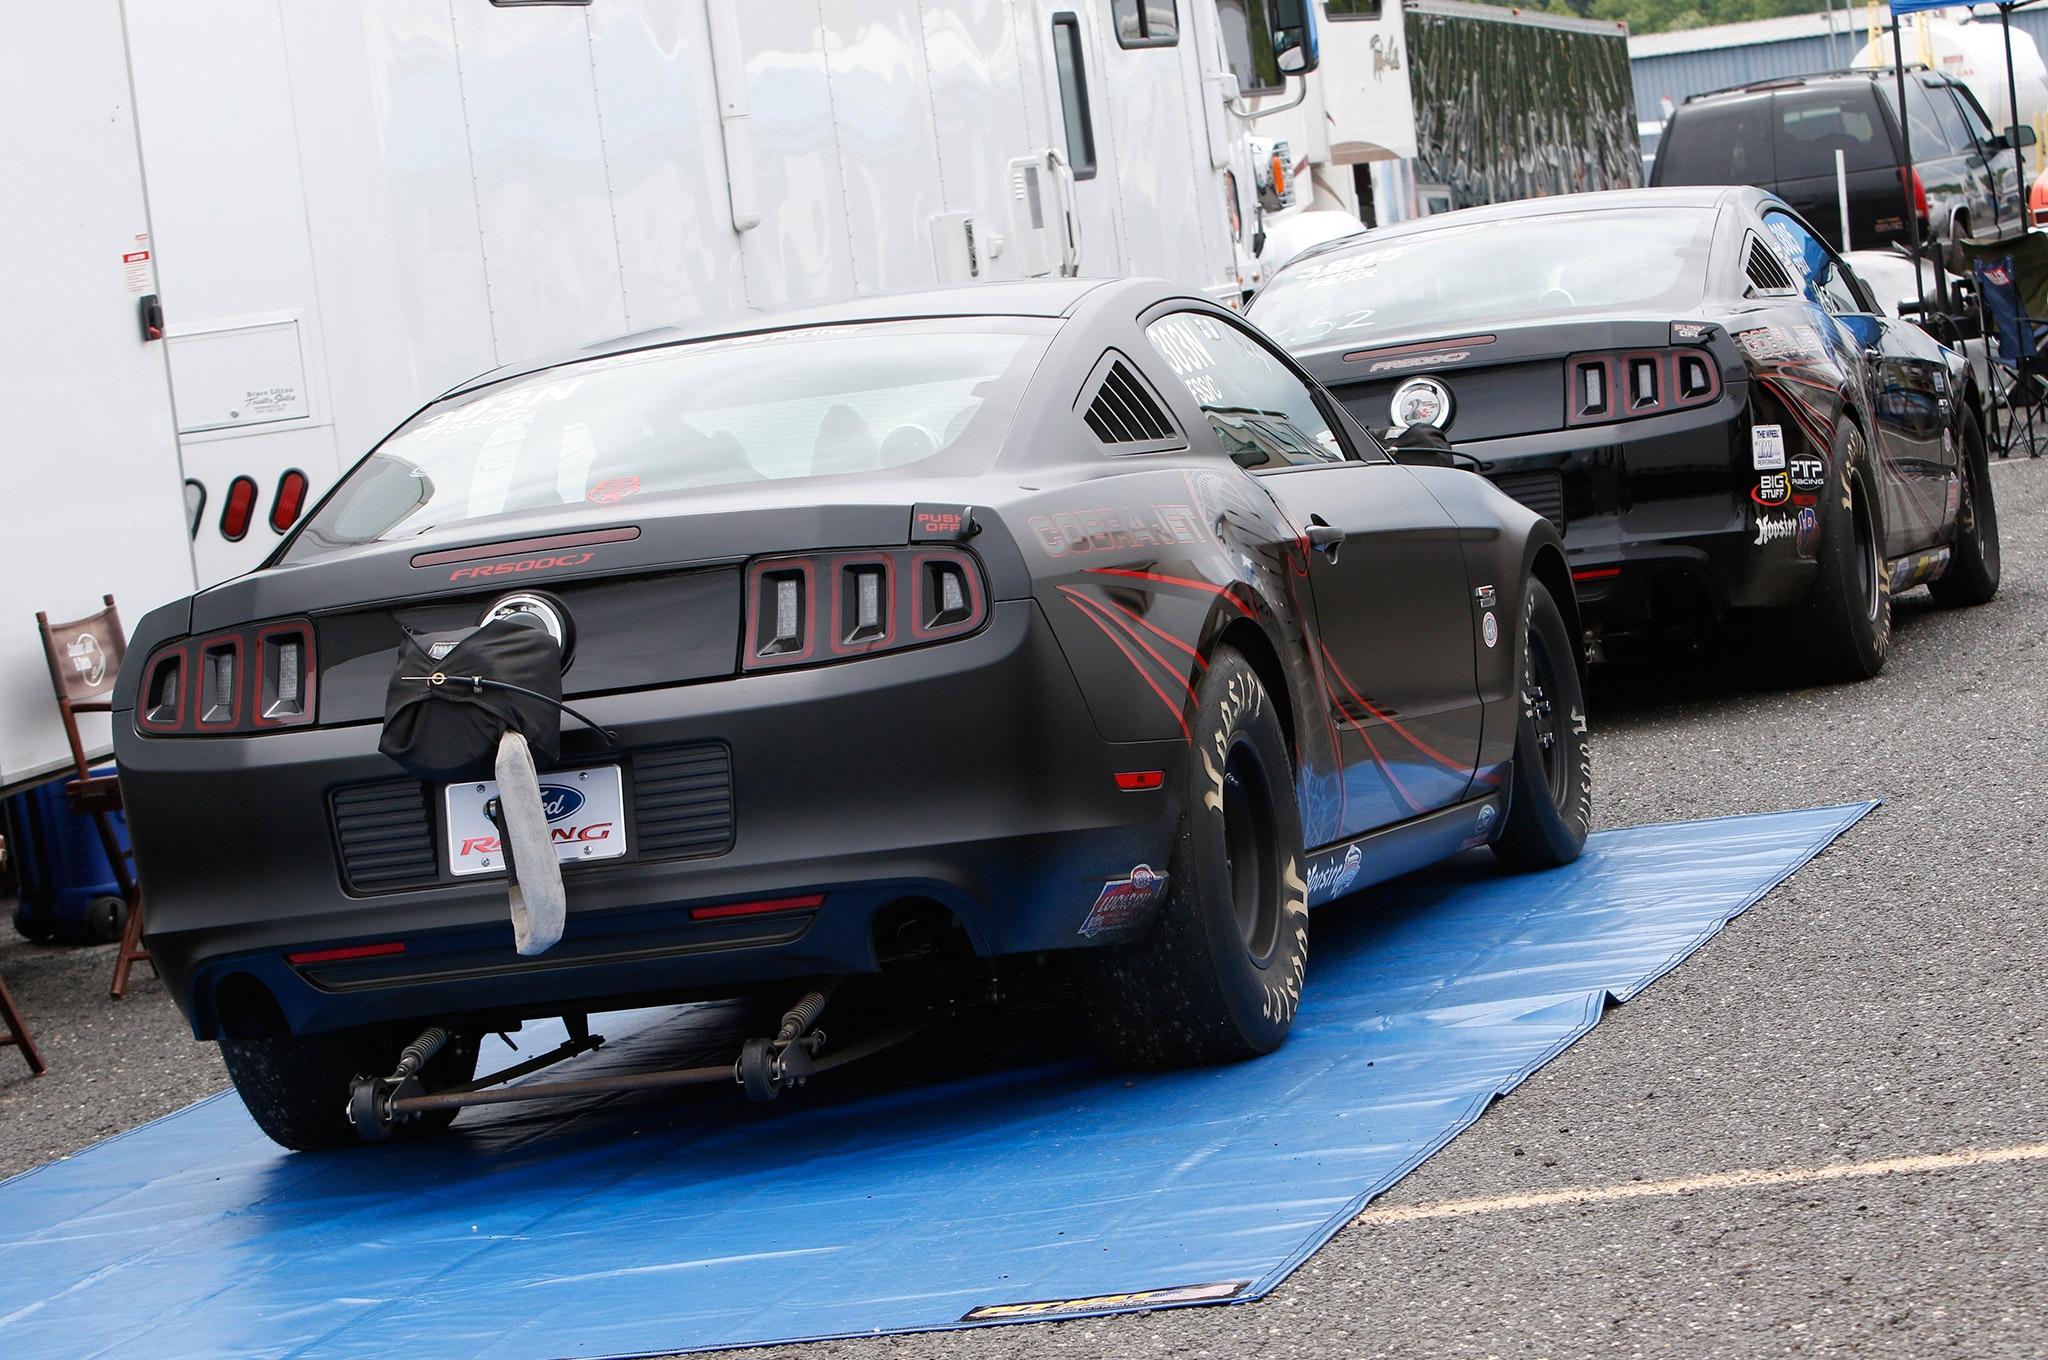 2015 Nhra Factory Showdown Mustang 04